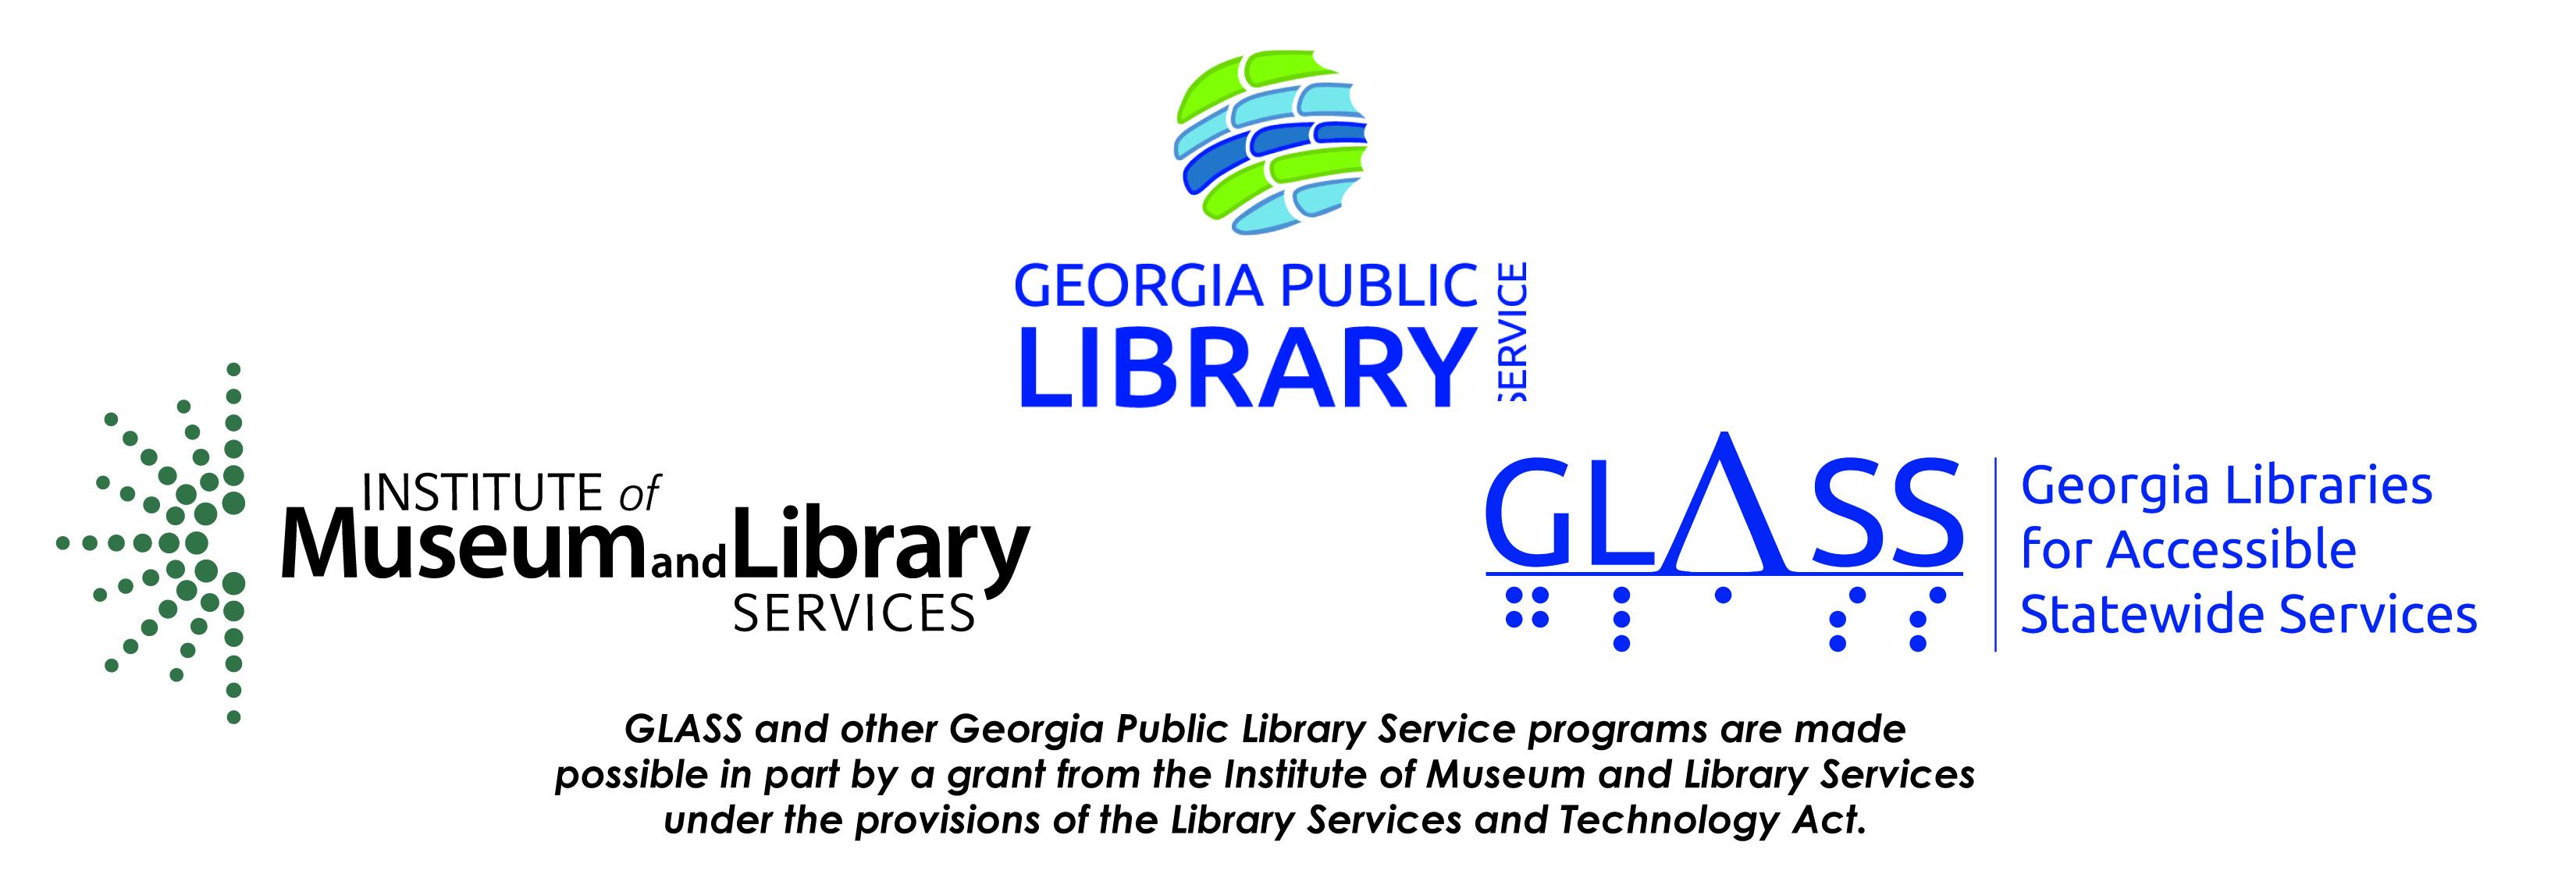 Georgia Public Library Banner